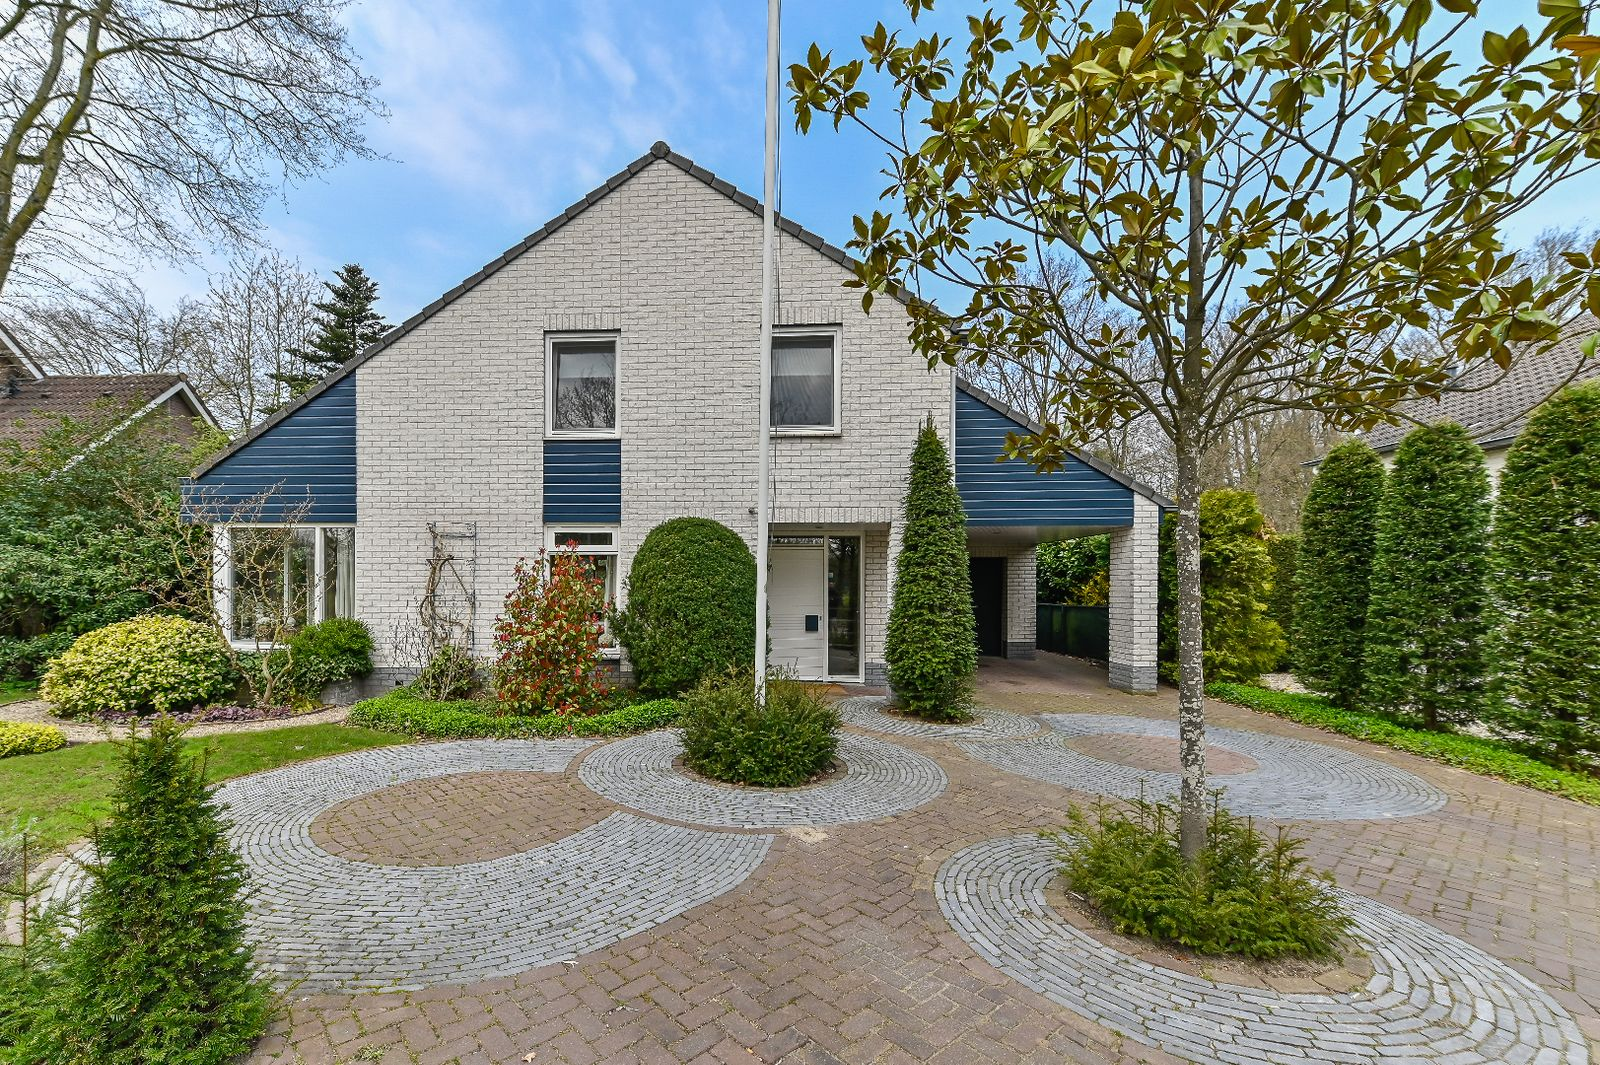 Louisenburgweg 14, Venlo